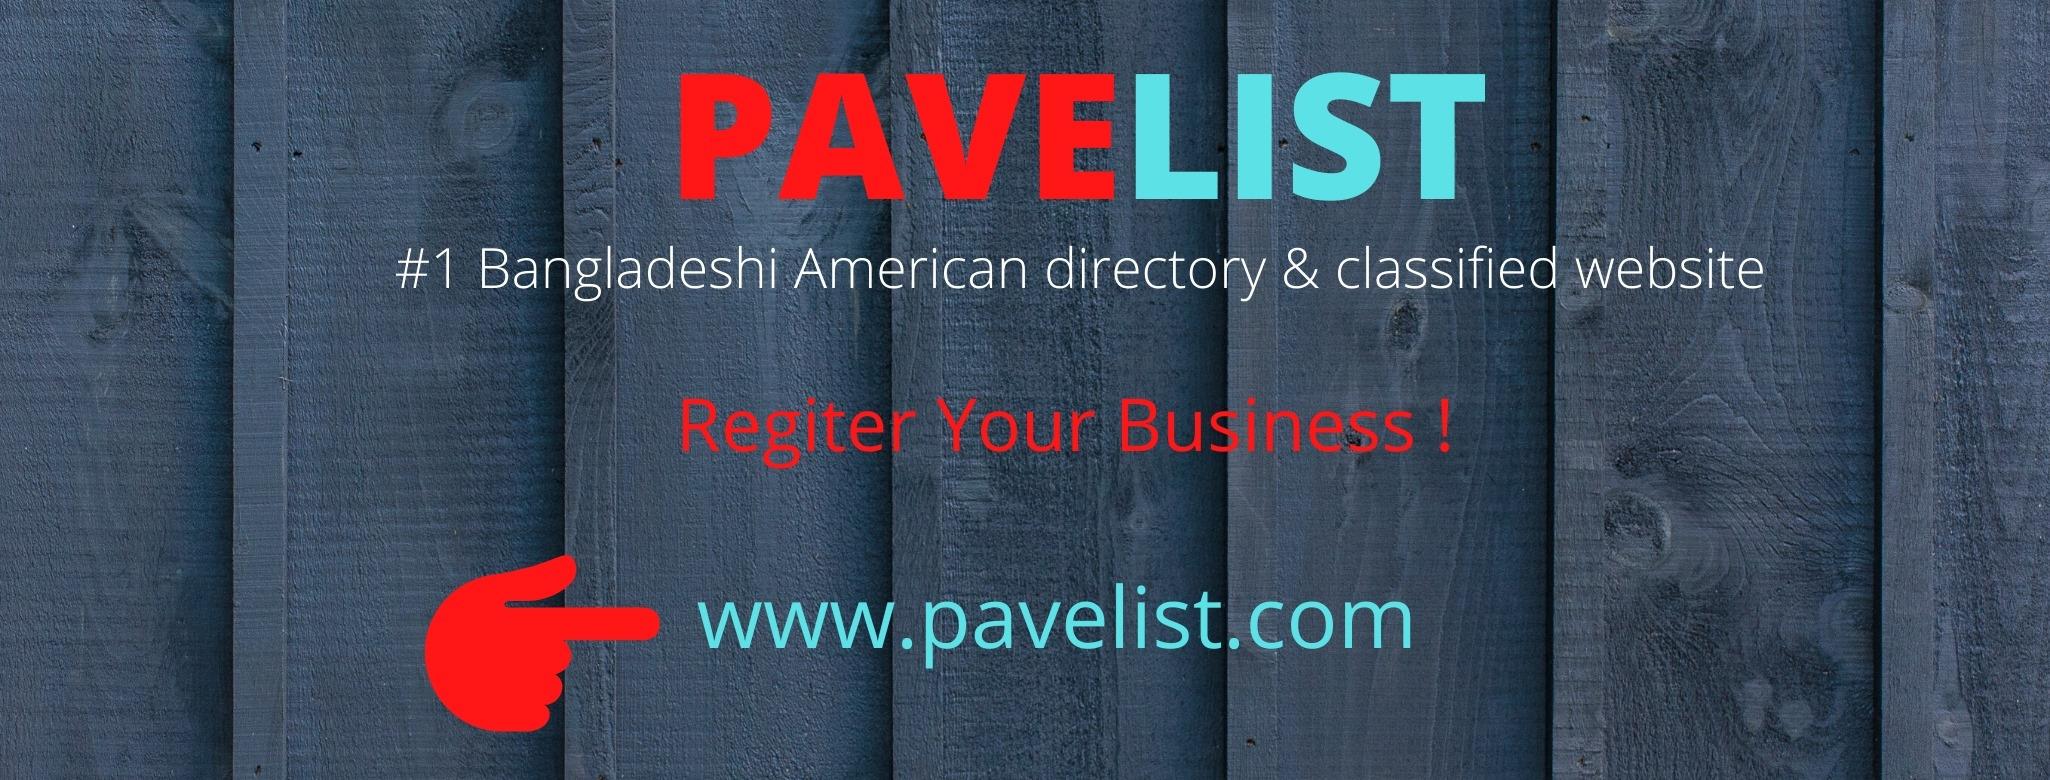 Pavelist (@pavelist) Cover Image